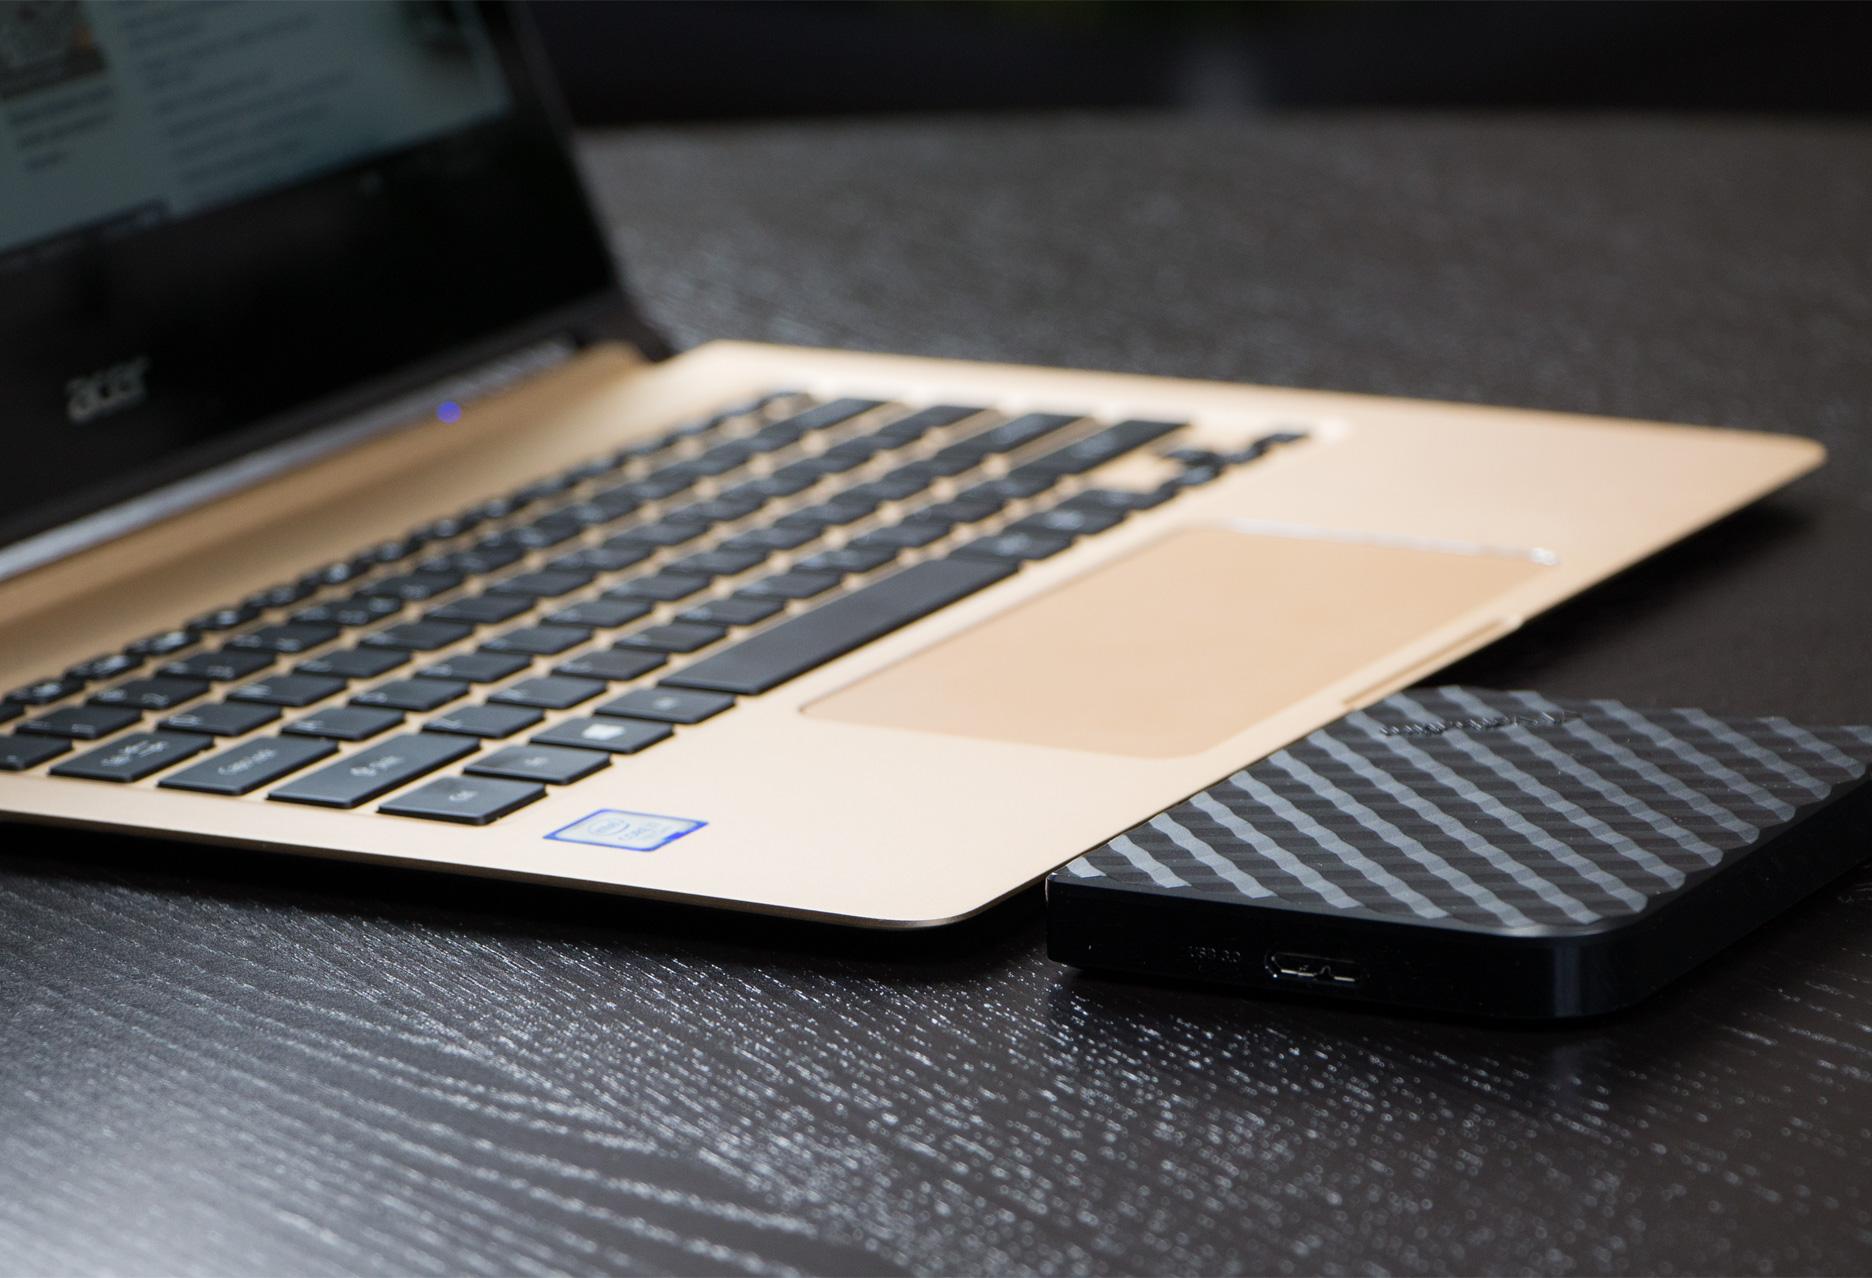 Acer Swift 7 vs dysk zewnętrzny